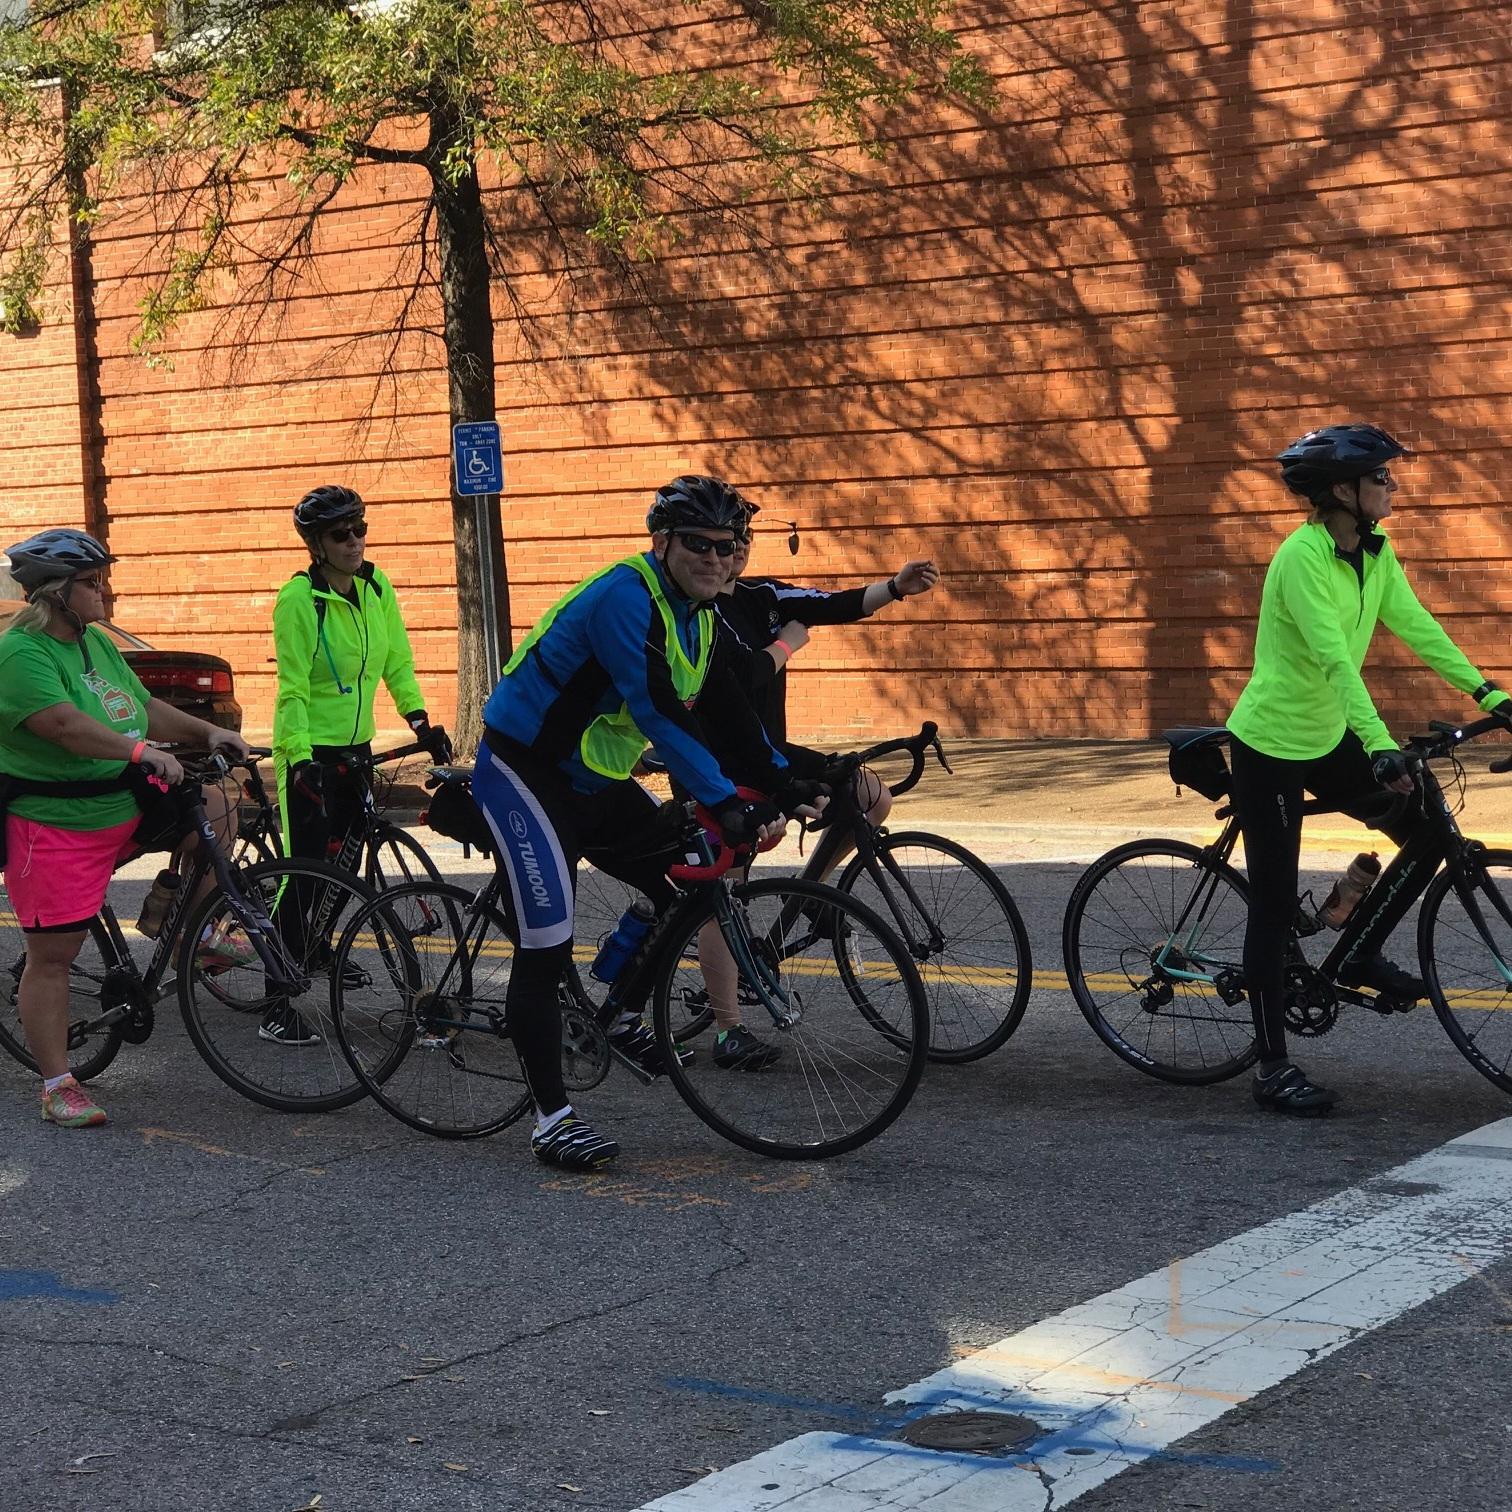 Confident-City-Cycling-Wheel-Movement-CSRA.jpg